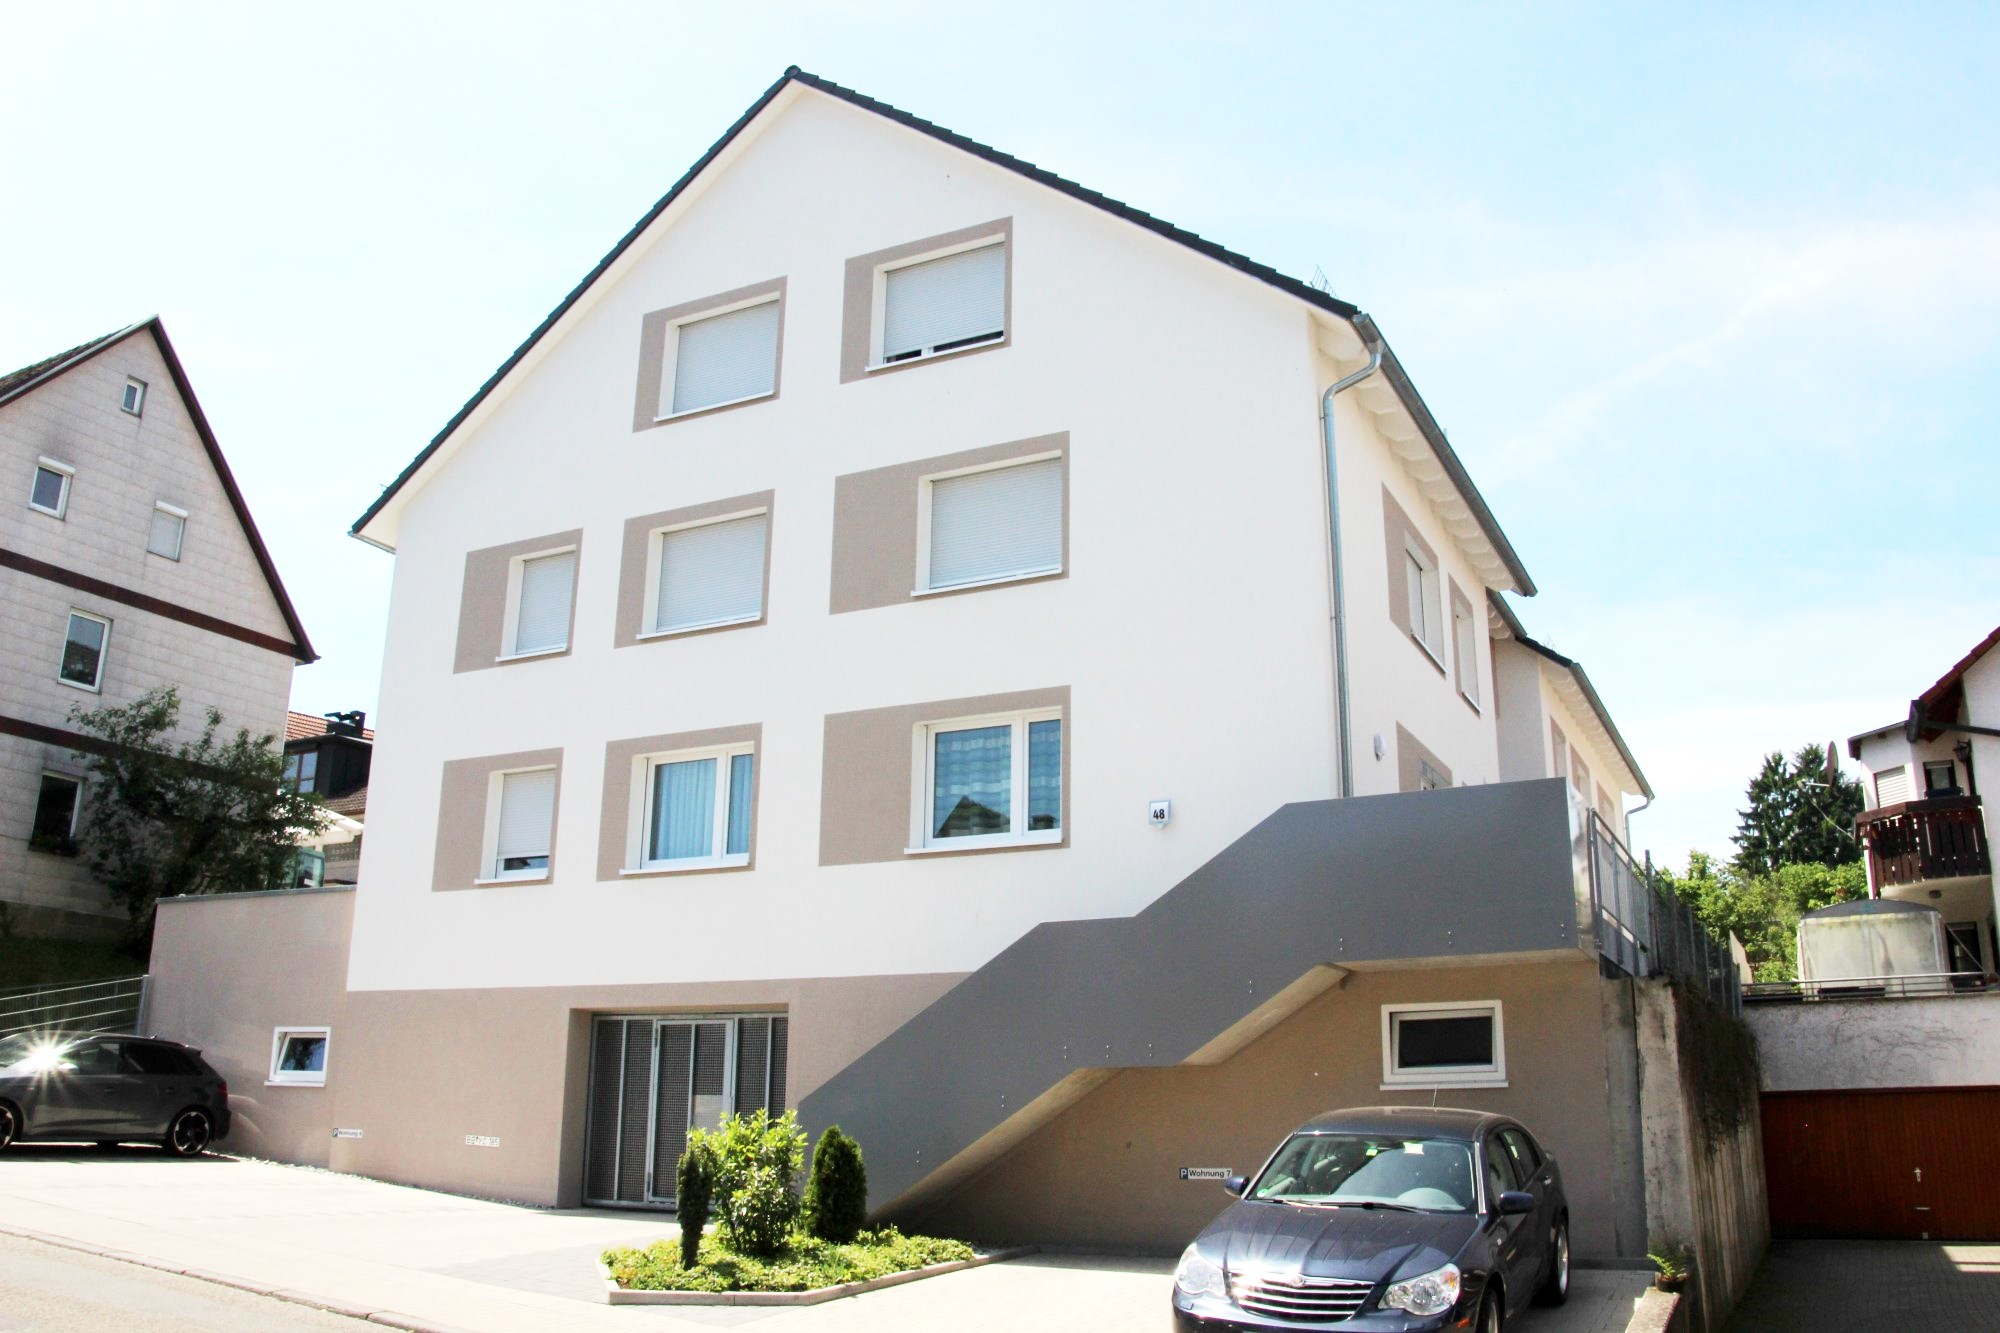 2017 | 8-Familienhaus Maichingerstraße in Magstadt, Architekt Dipl. Ing. Sandra Rapino